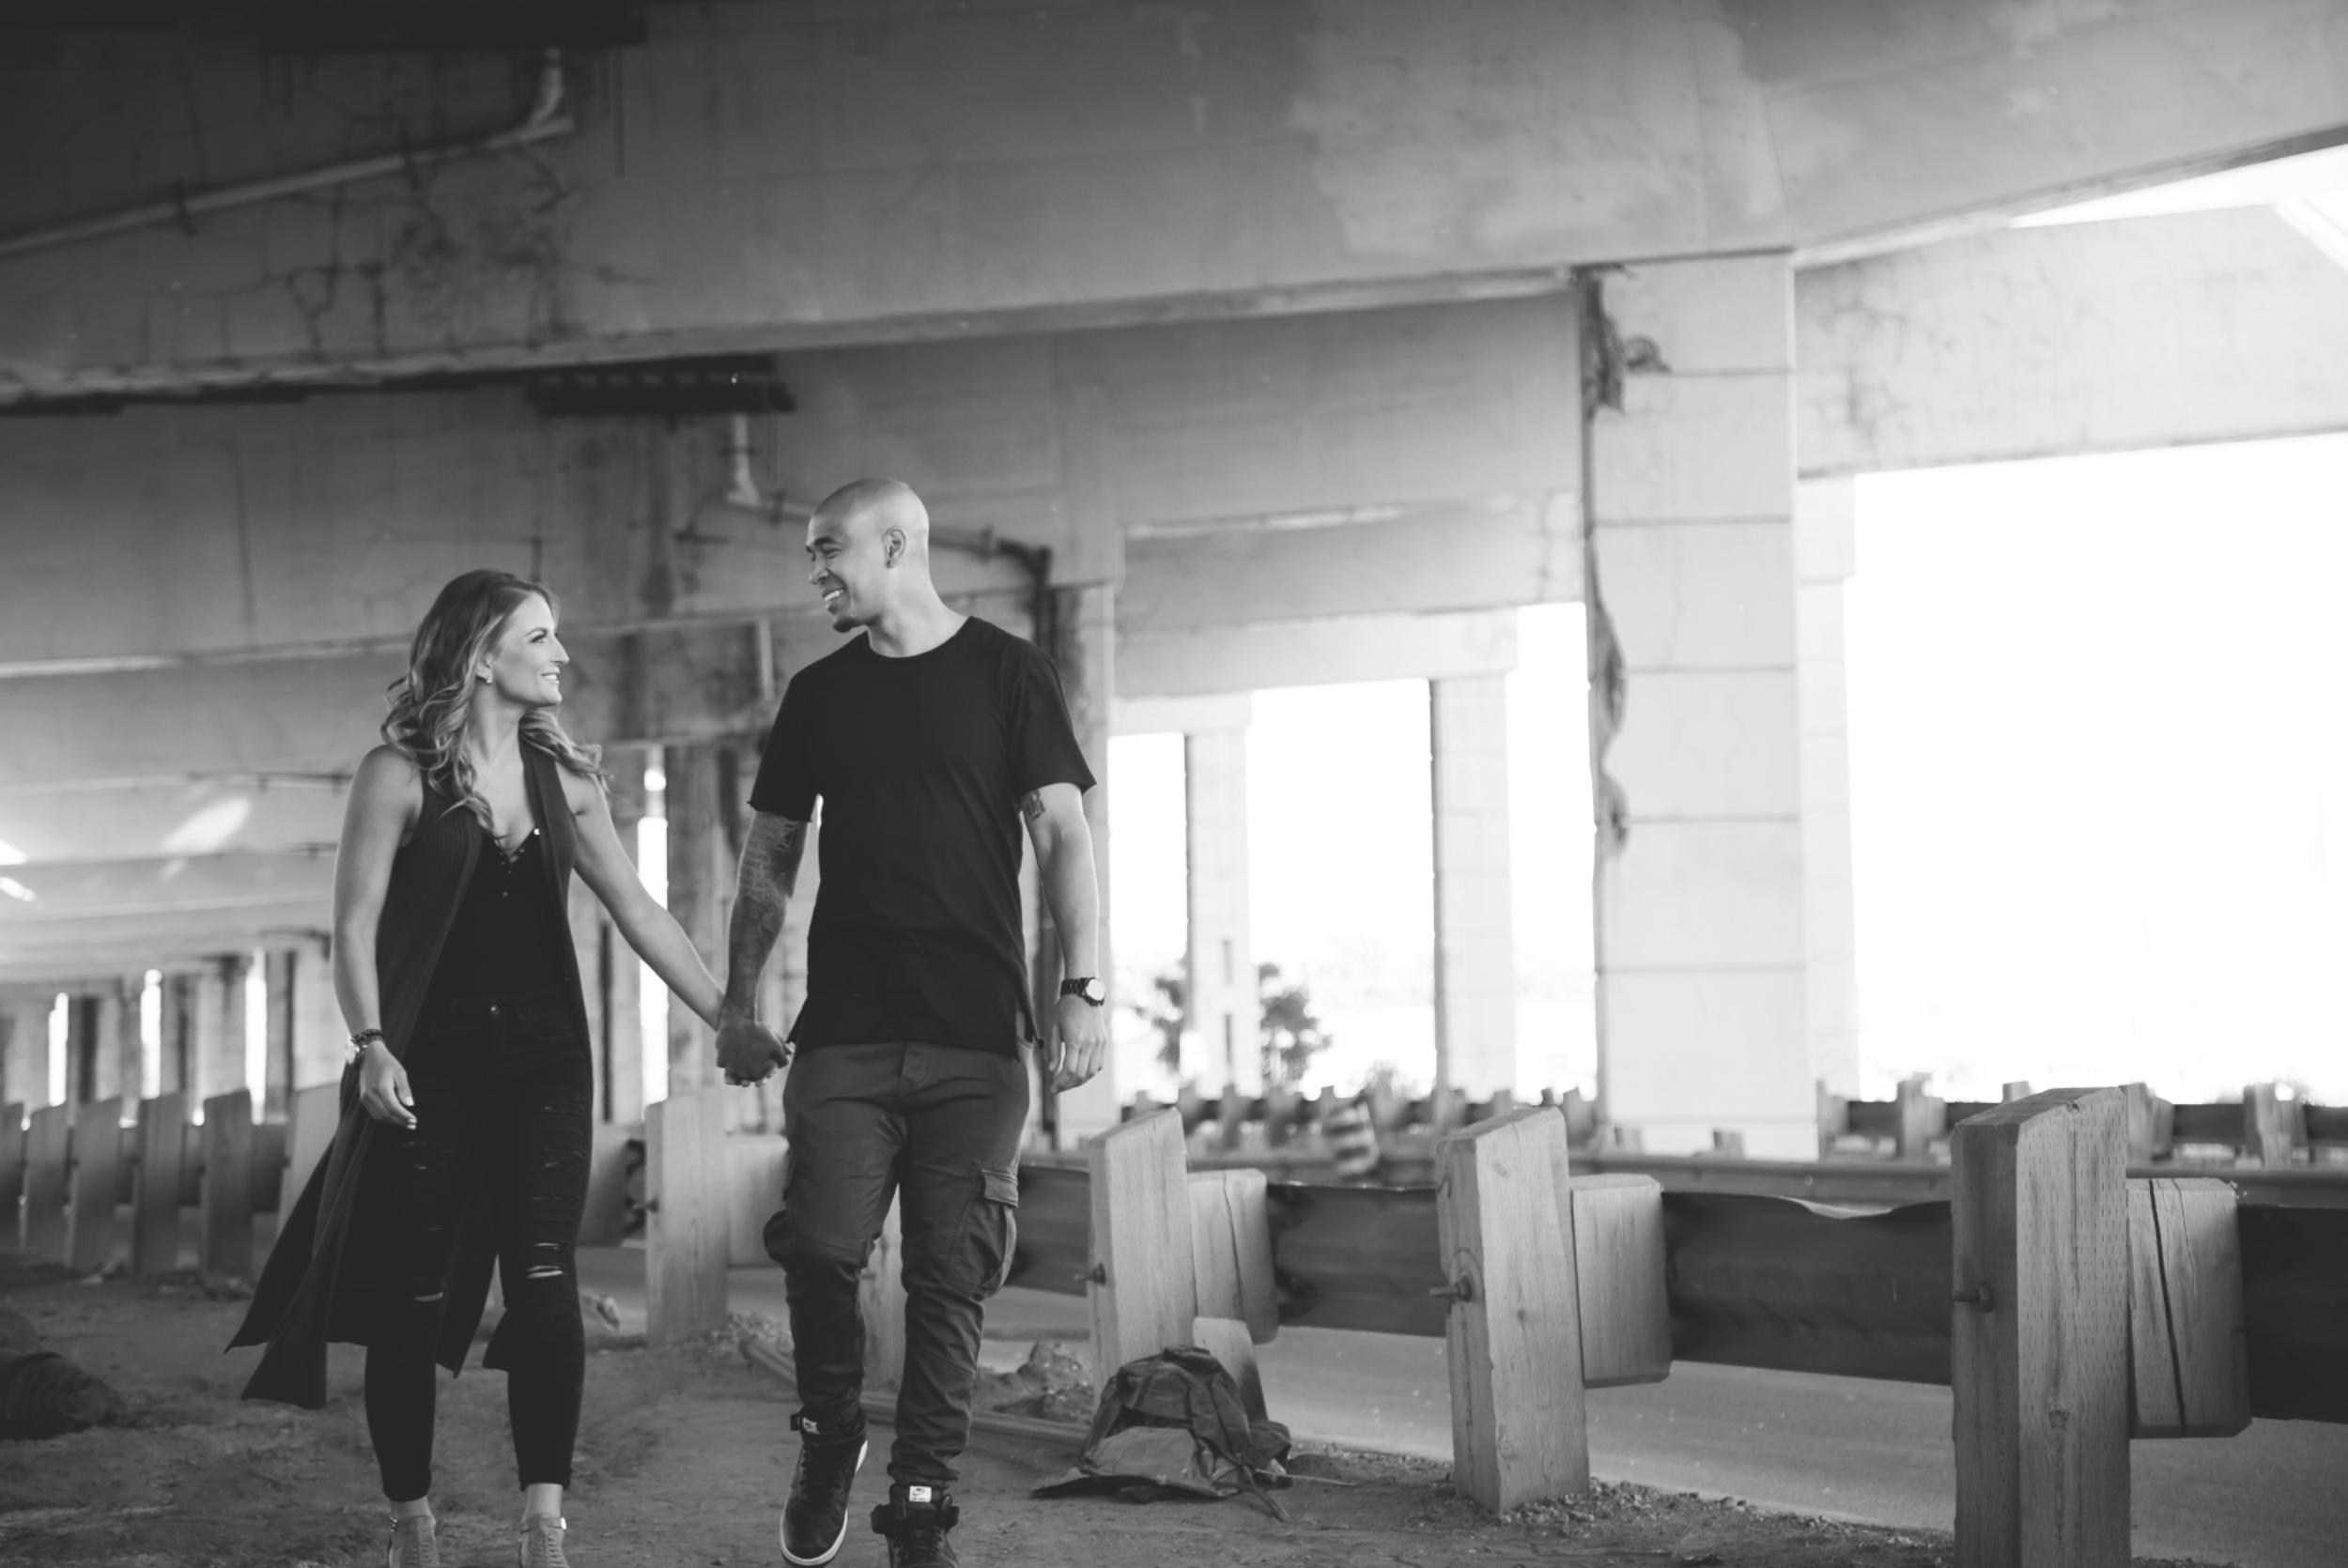 Engagement-Photos-Toronto-Downtown-Waterfront-Photographer-Wedding-Hamilton-GTA-Niagara-Oakville-Modern-Moments-by-Lauren-Engaged-Photography-Photo-Image-7.png